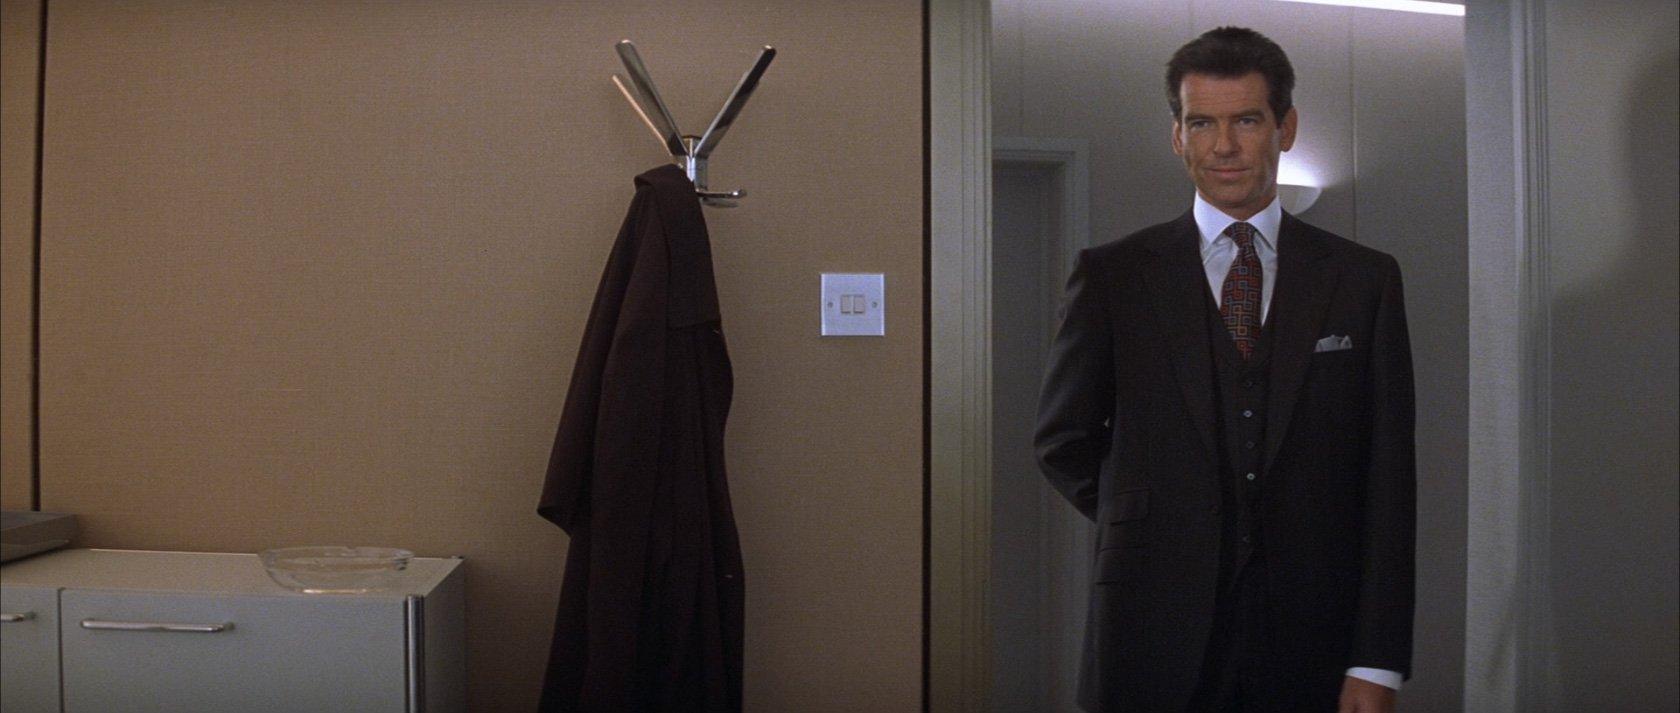 http://www.bondsuits.com/wp-content/uploads/2010/12/The-World-Is-Not-Enough-Pinstripe-Suit.jpg